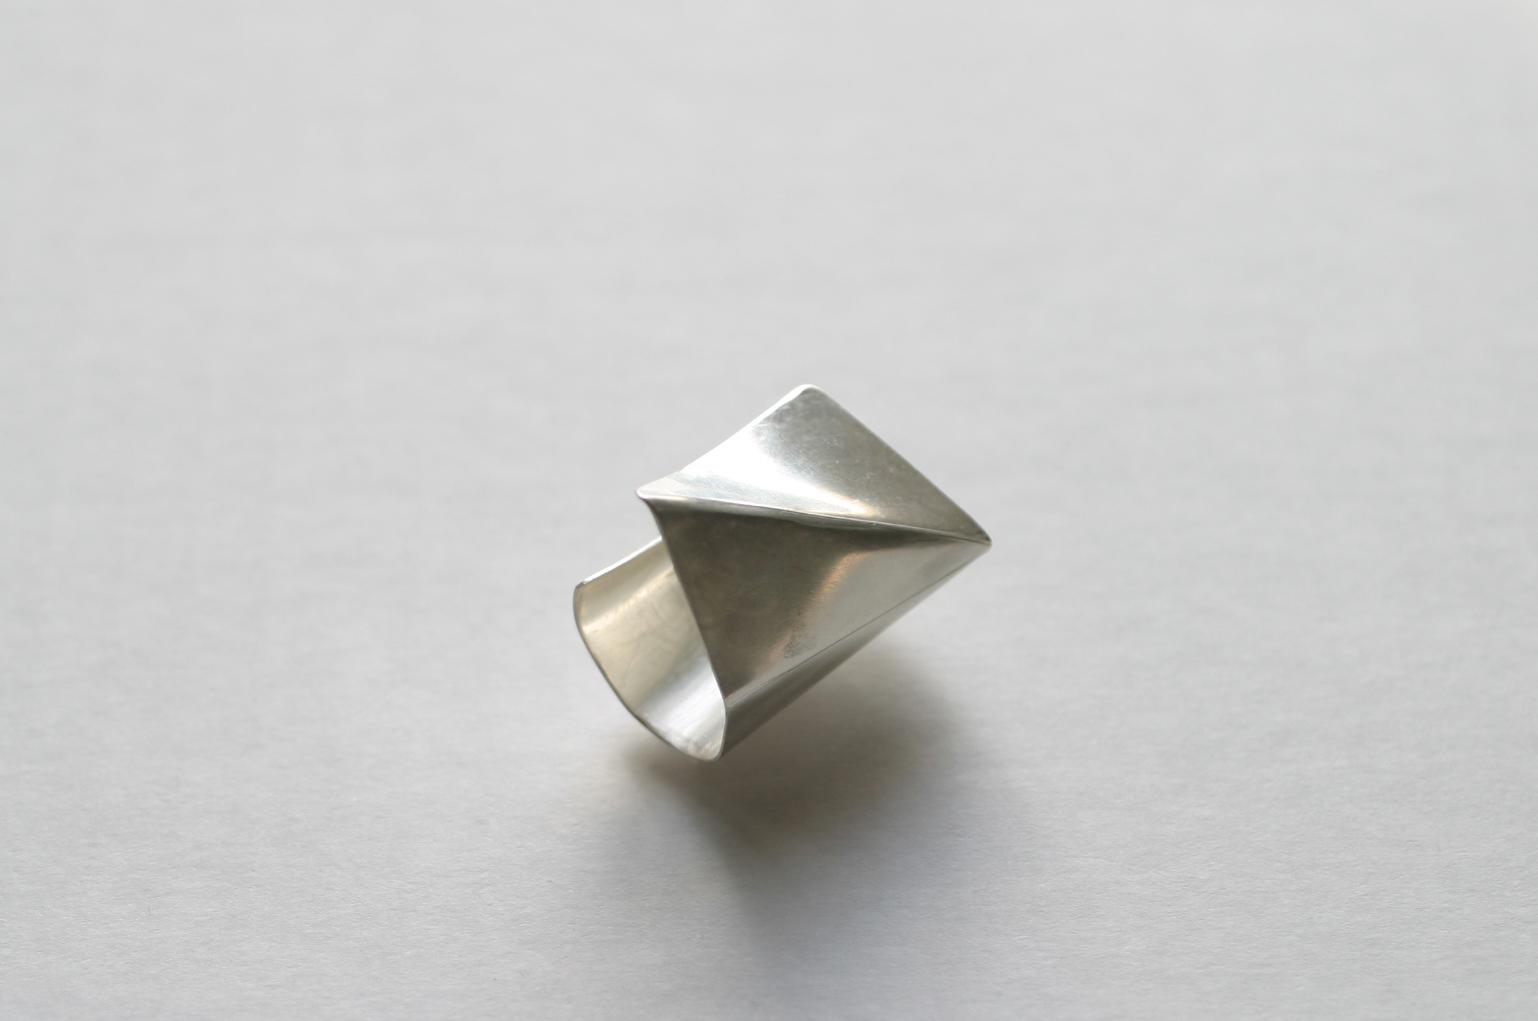 Elizabeth Baird Architecture-Jewelery-folded ring.jpg